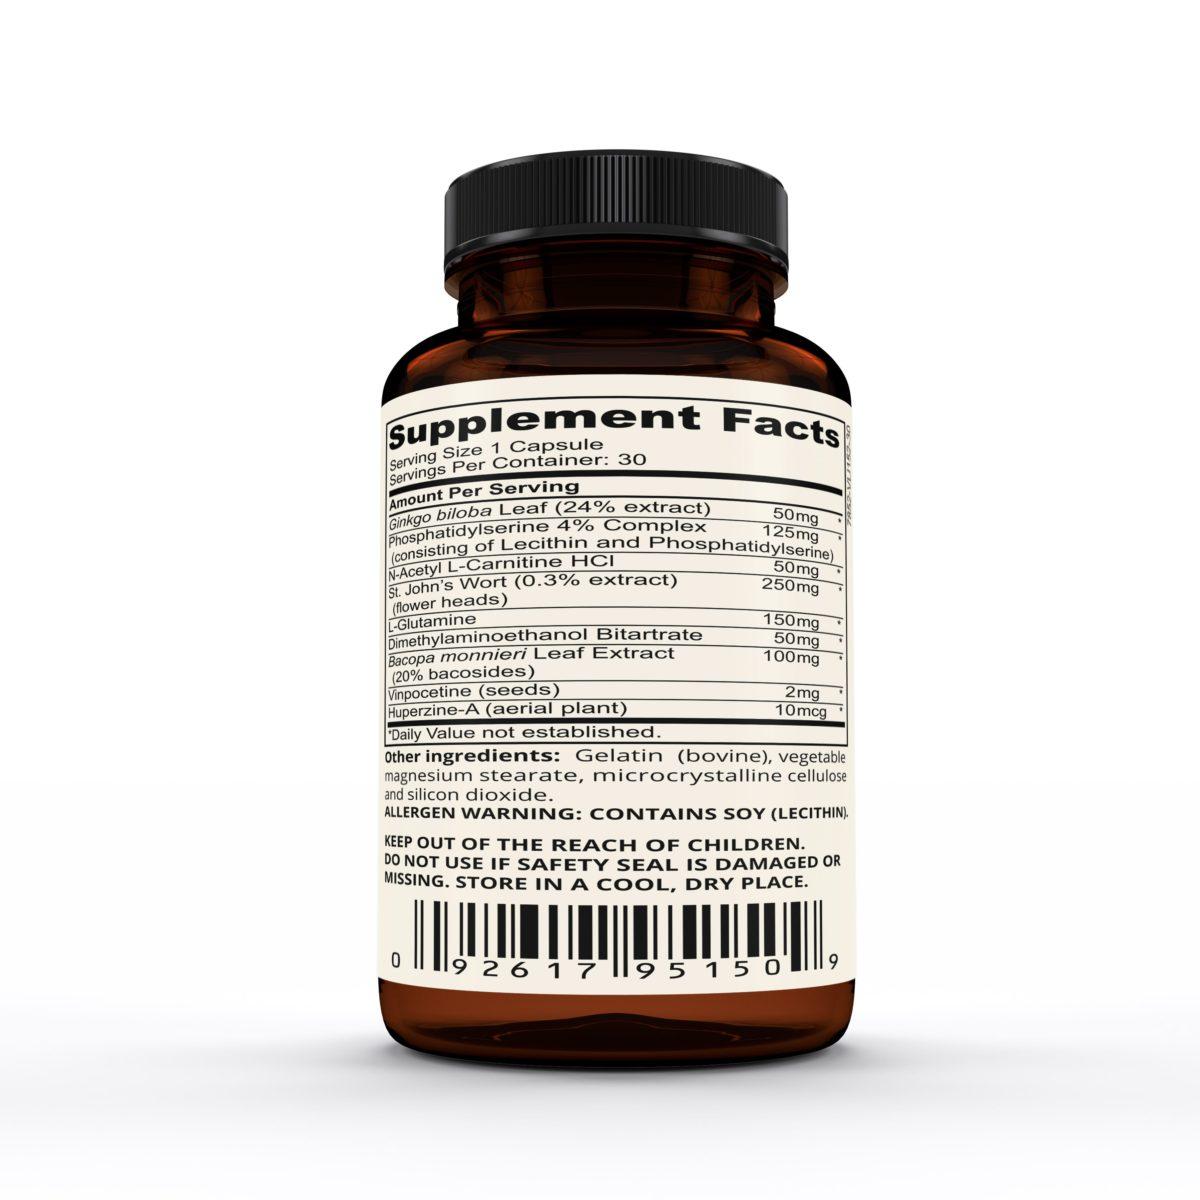 nootrolux supplement facts